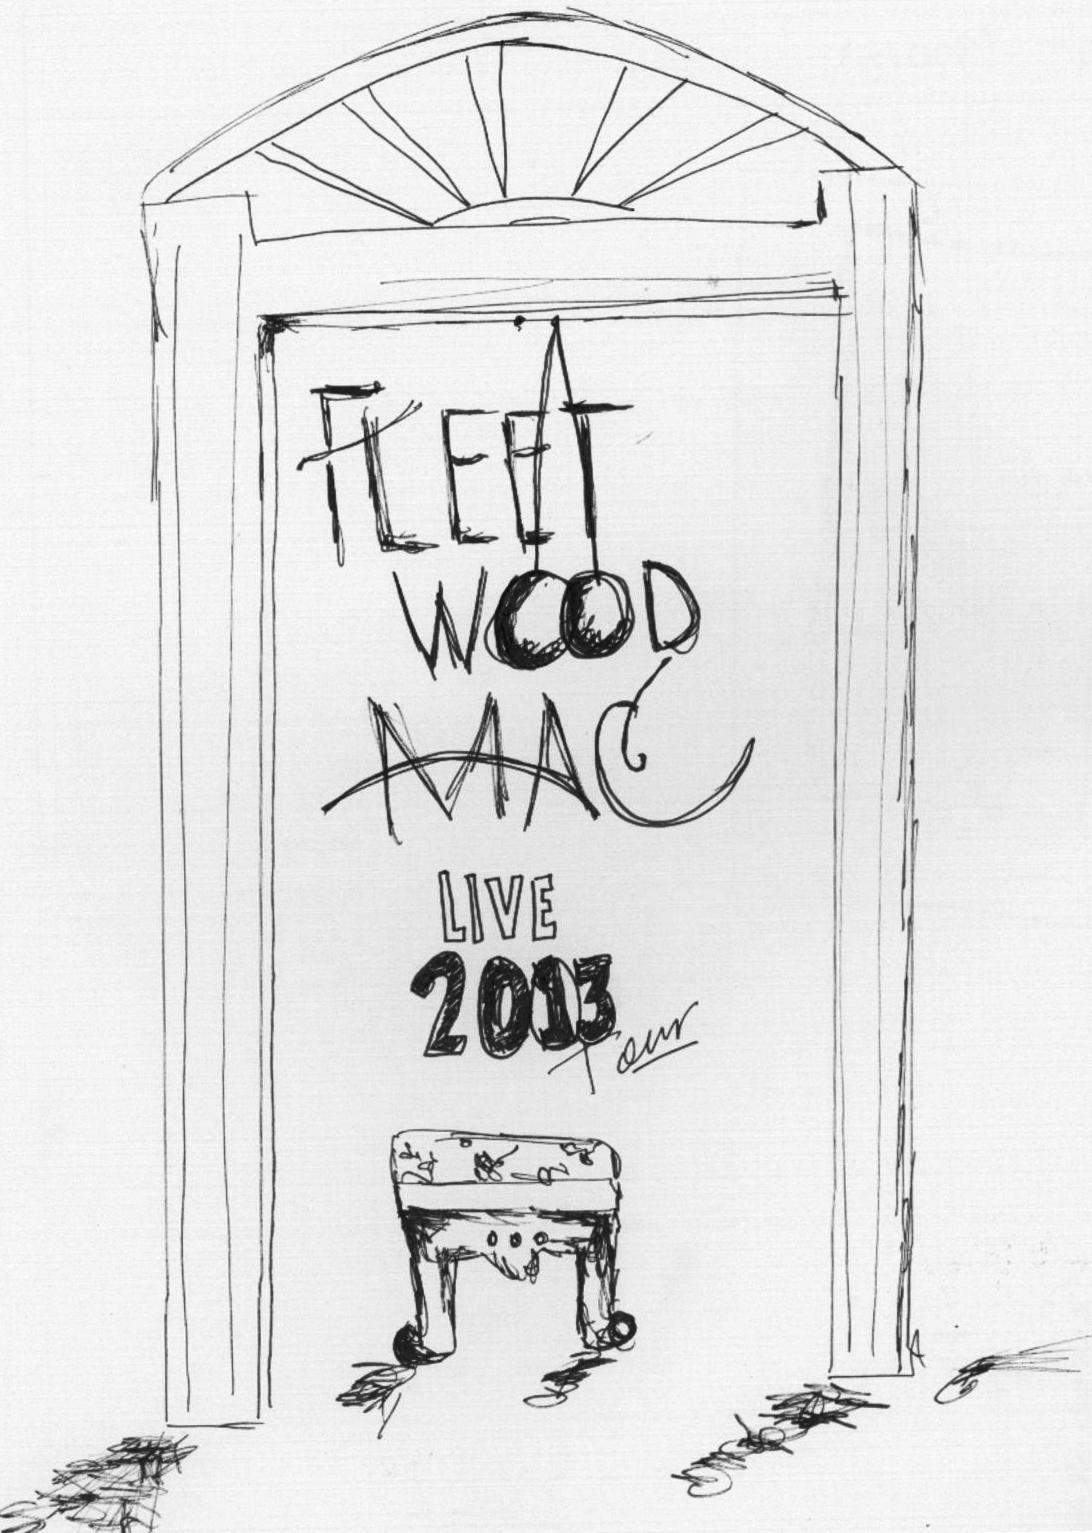 Fleetwood Mac Live 2013 Tour - image 8 - student project